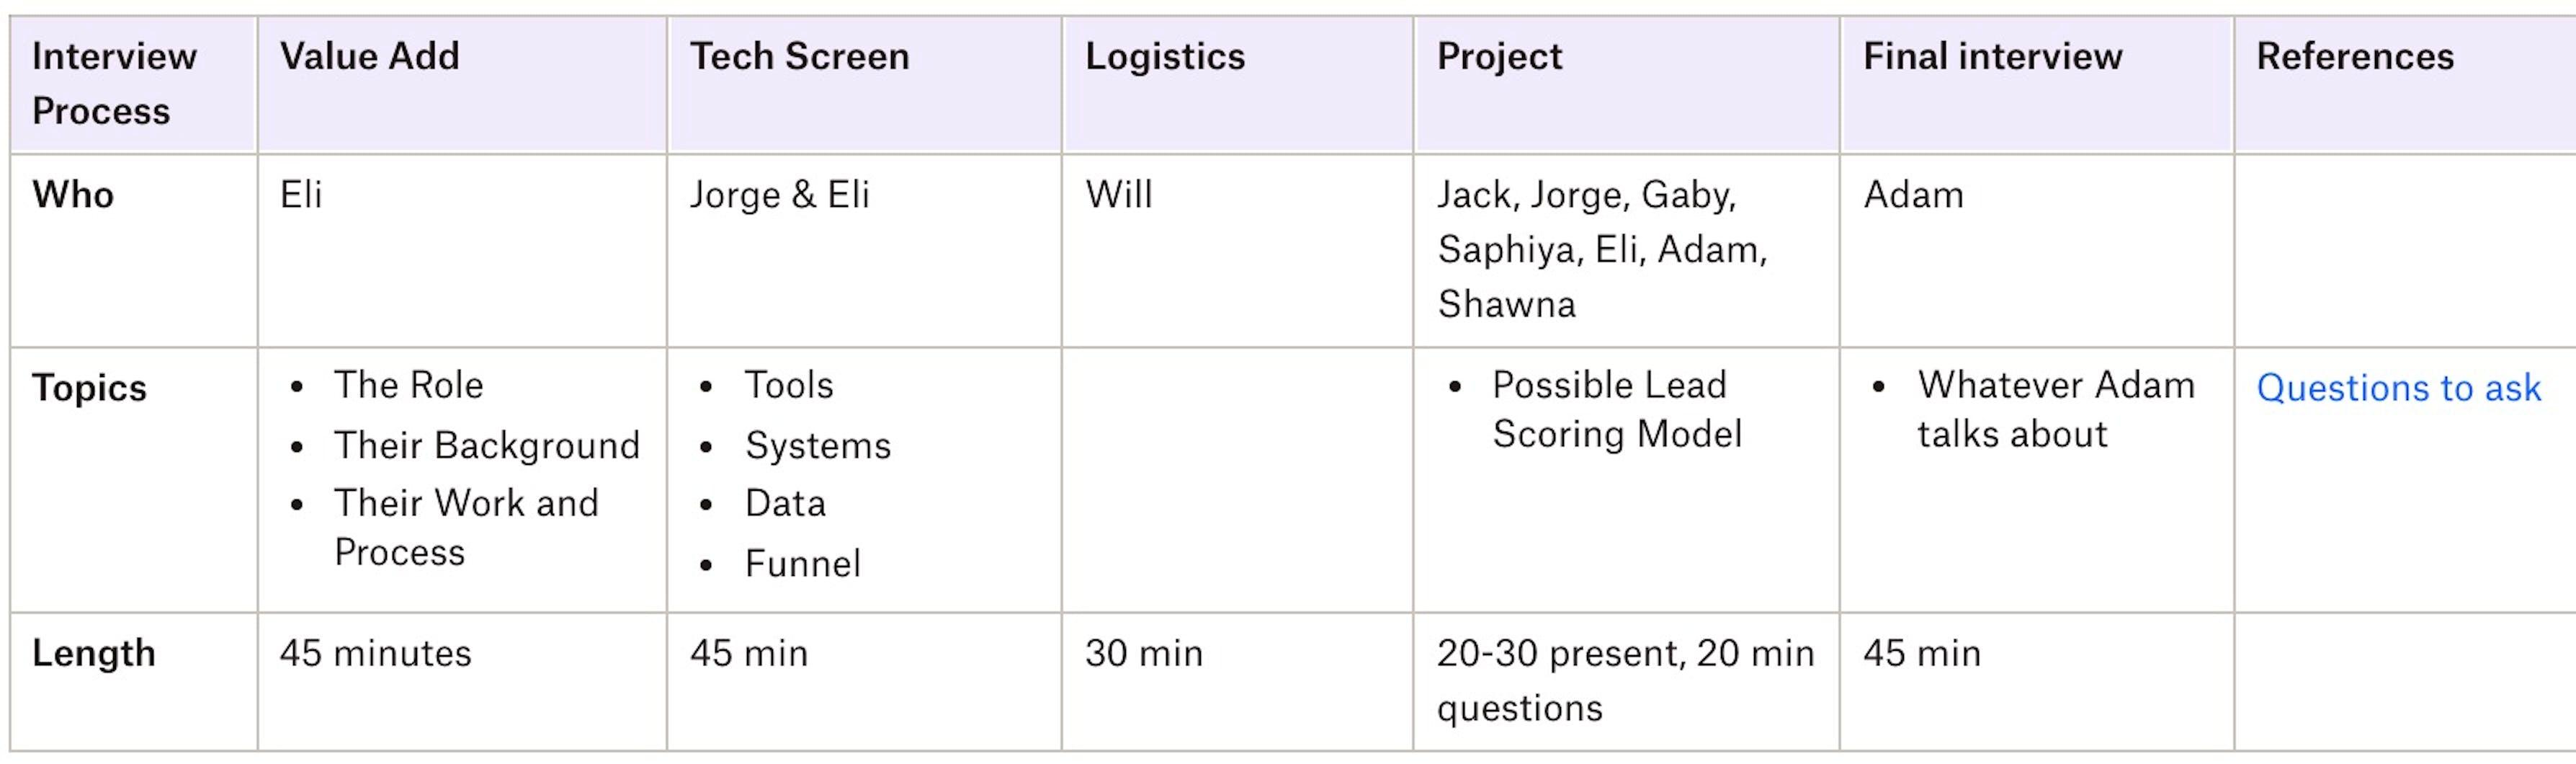 example hiring process document